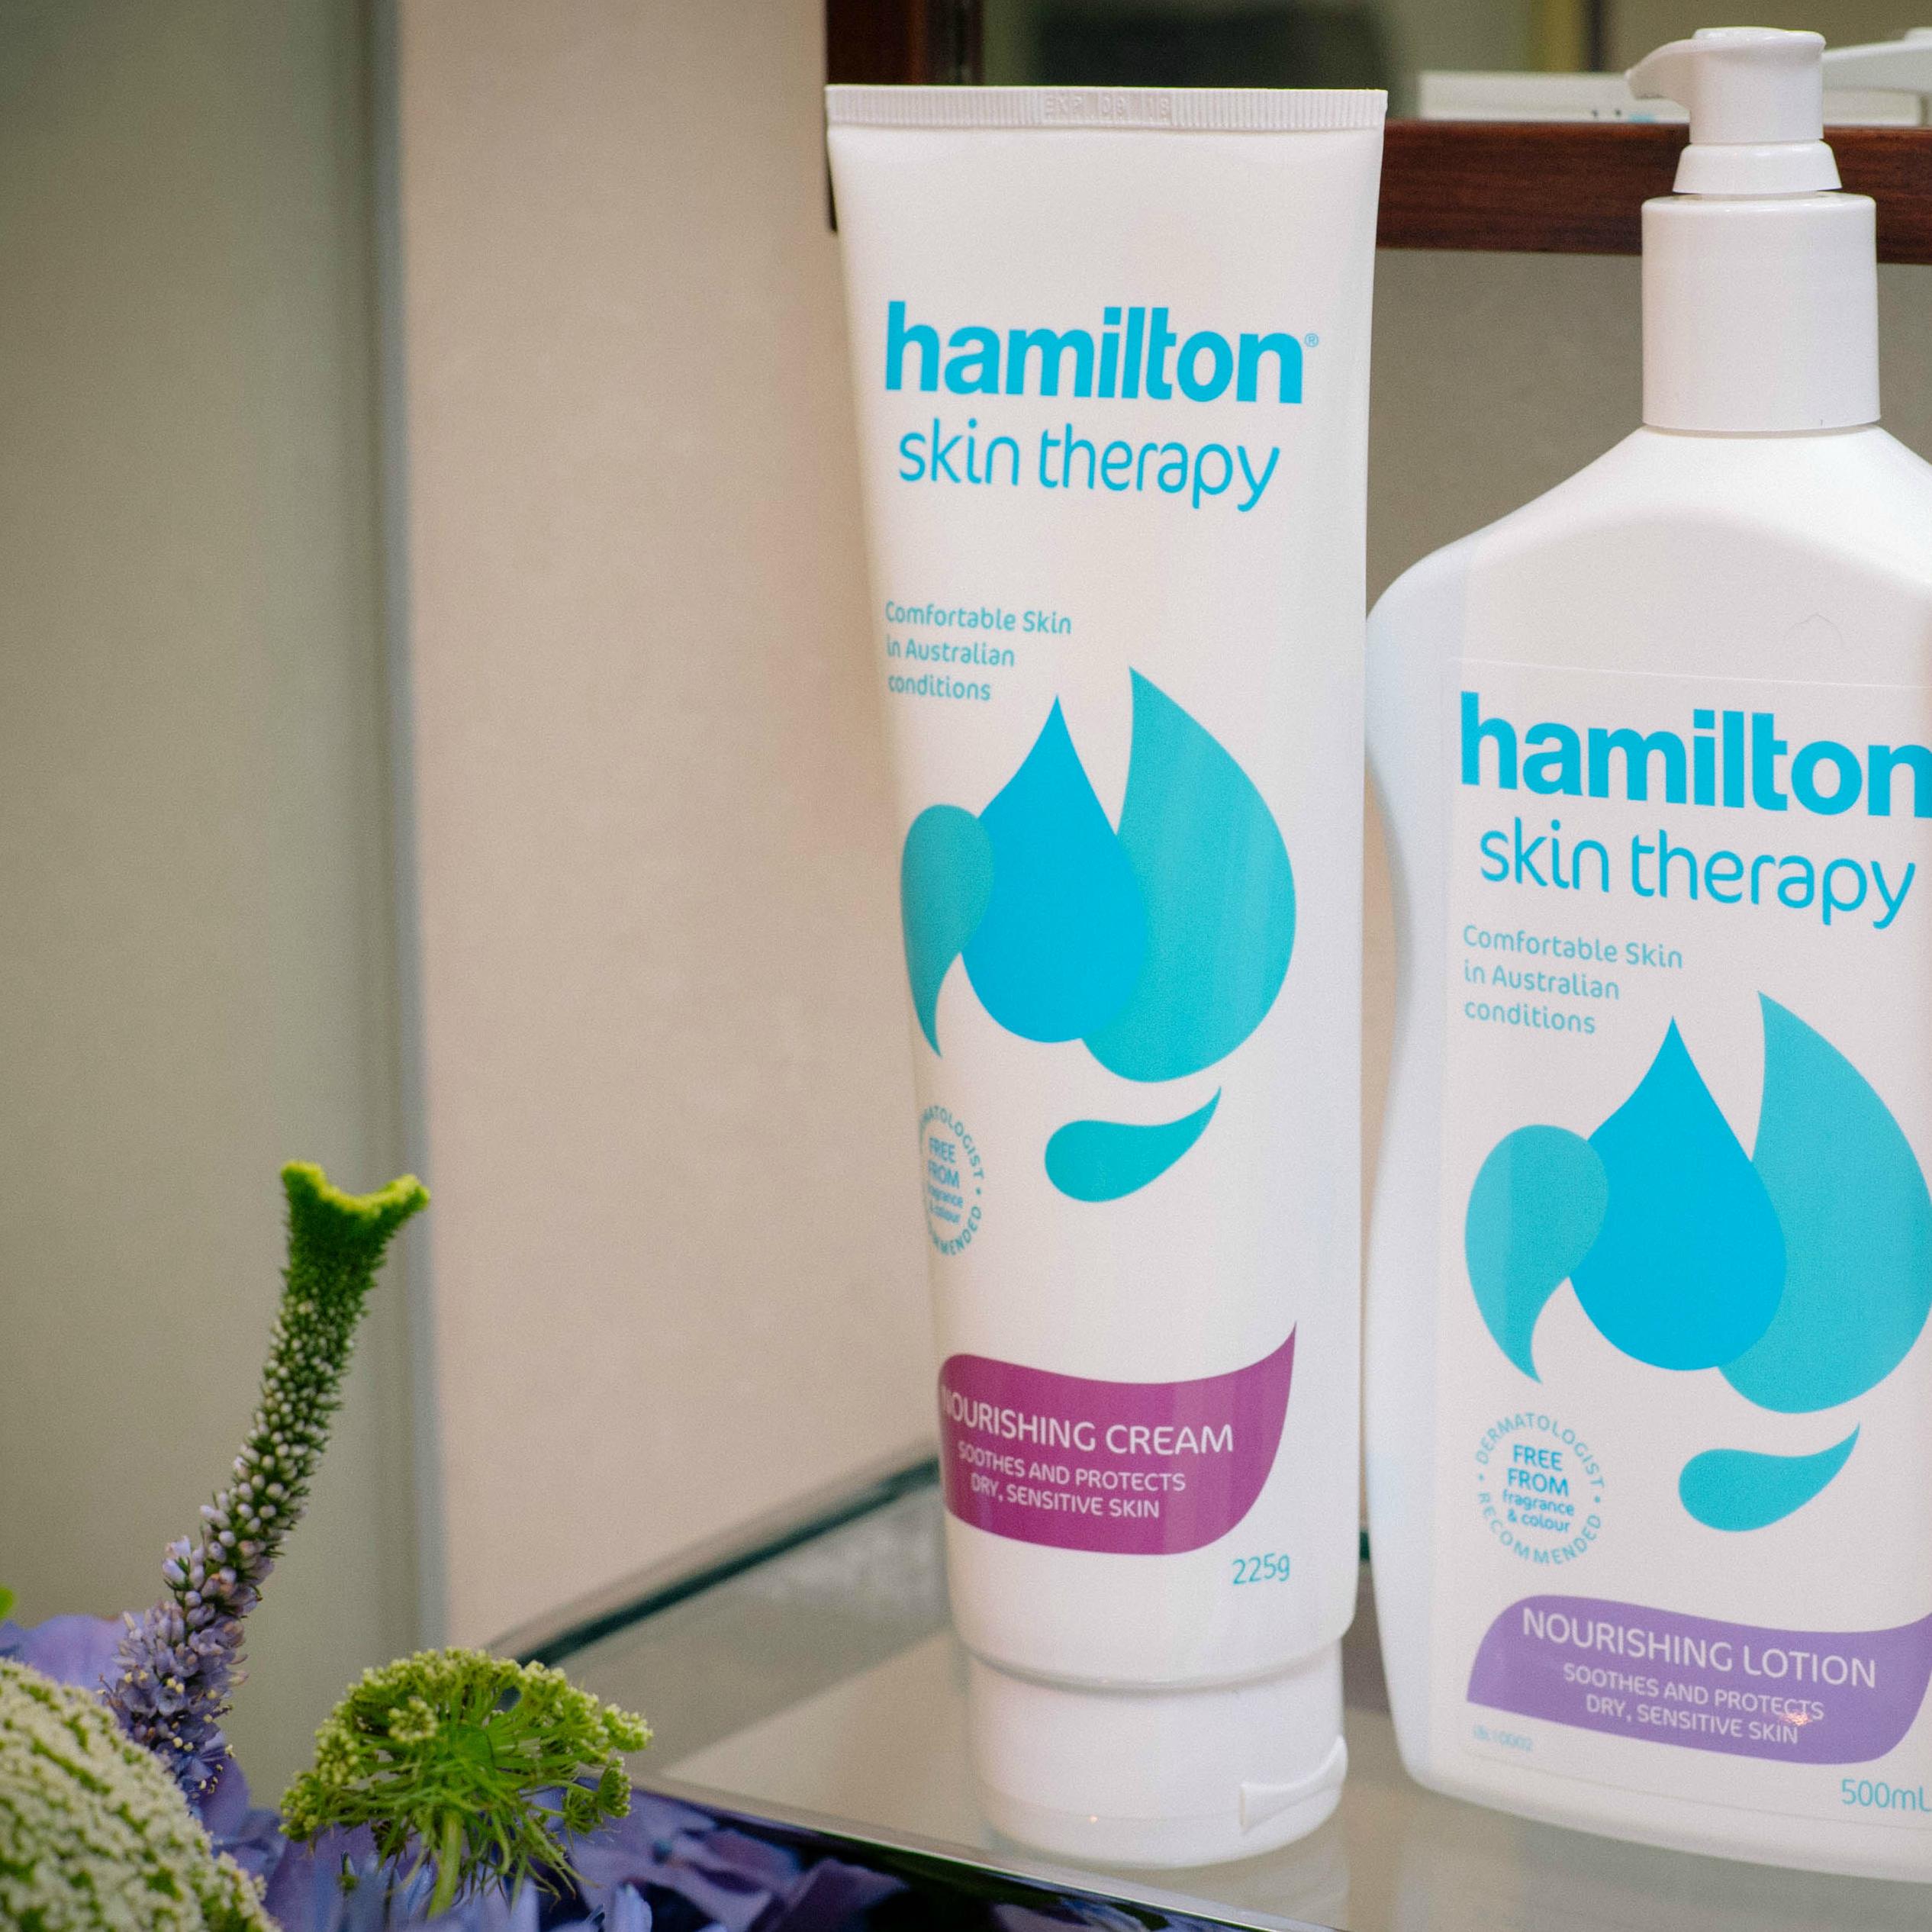 Hamilton Skin Therapy